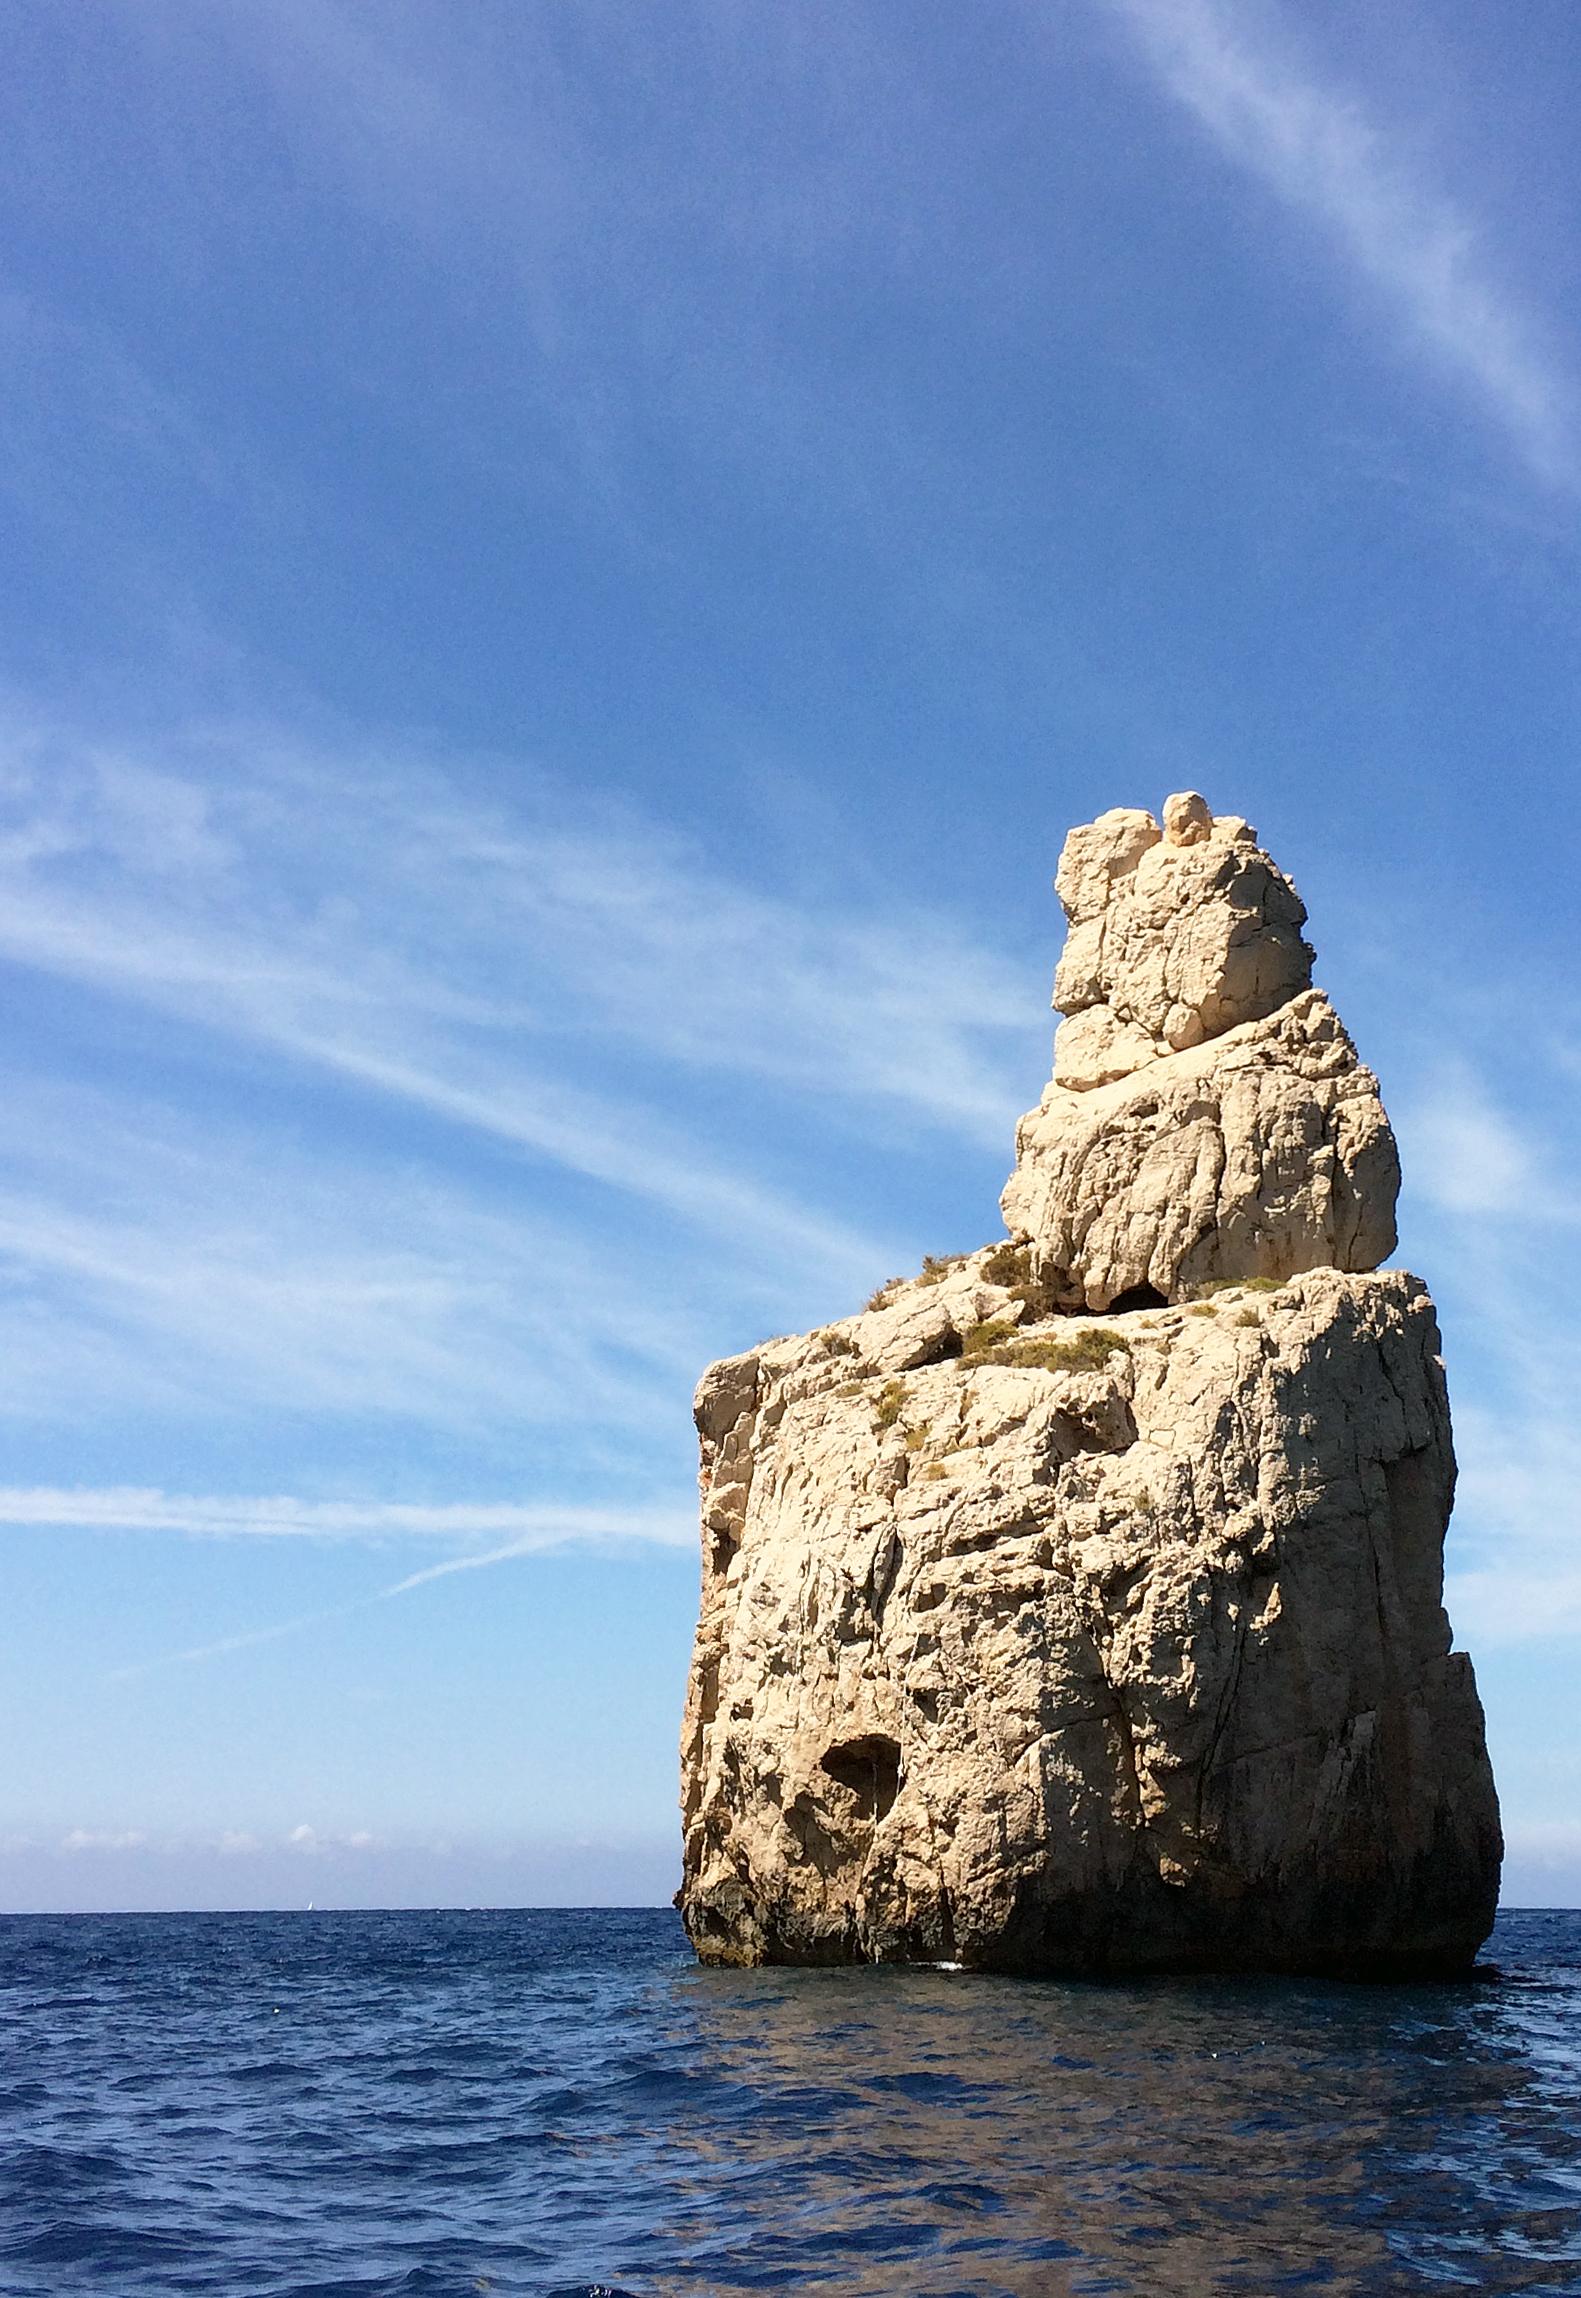 Ibiza-Strand-Blick-Mittelmeer-Felsen-Ausflug-Motorboot-Travelblog-jennadores-Reisetipp